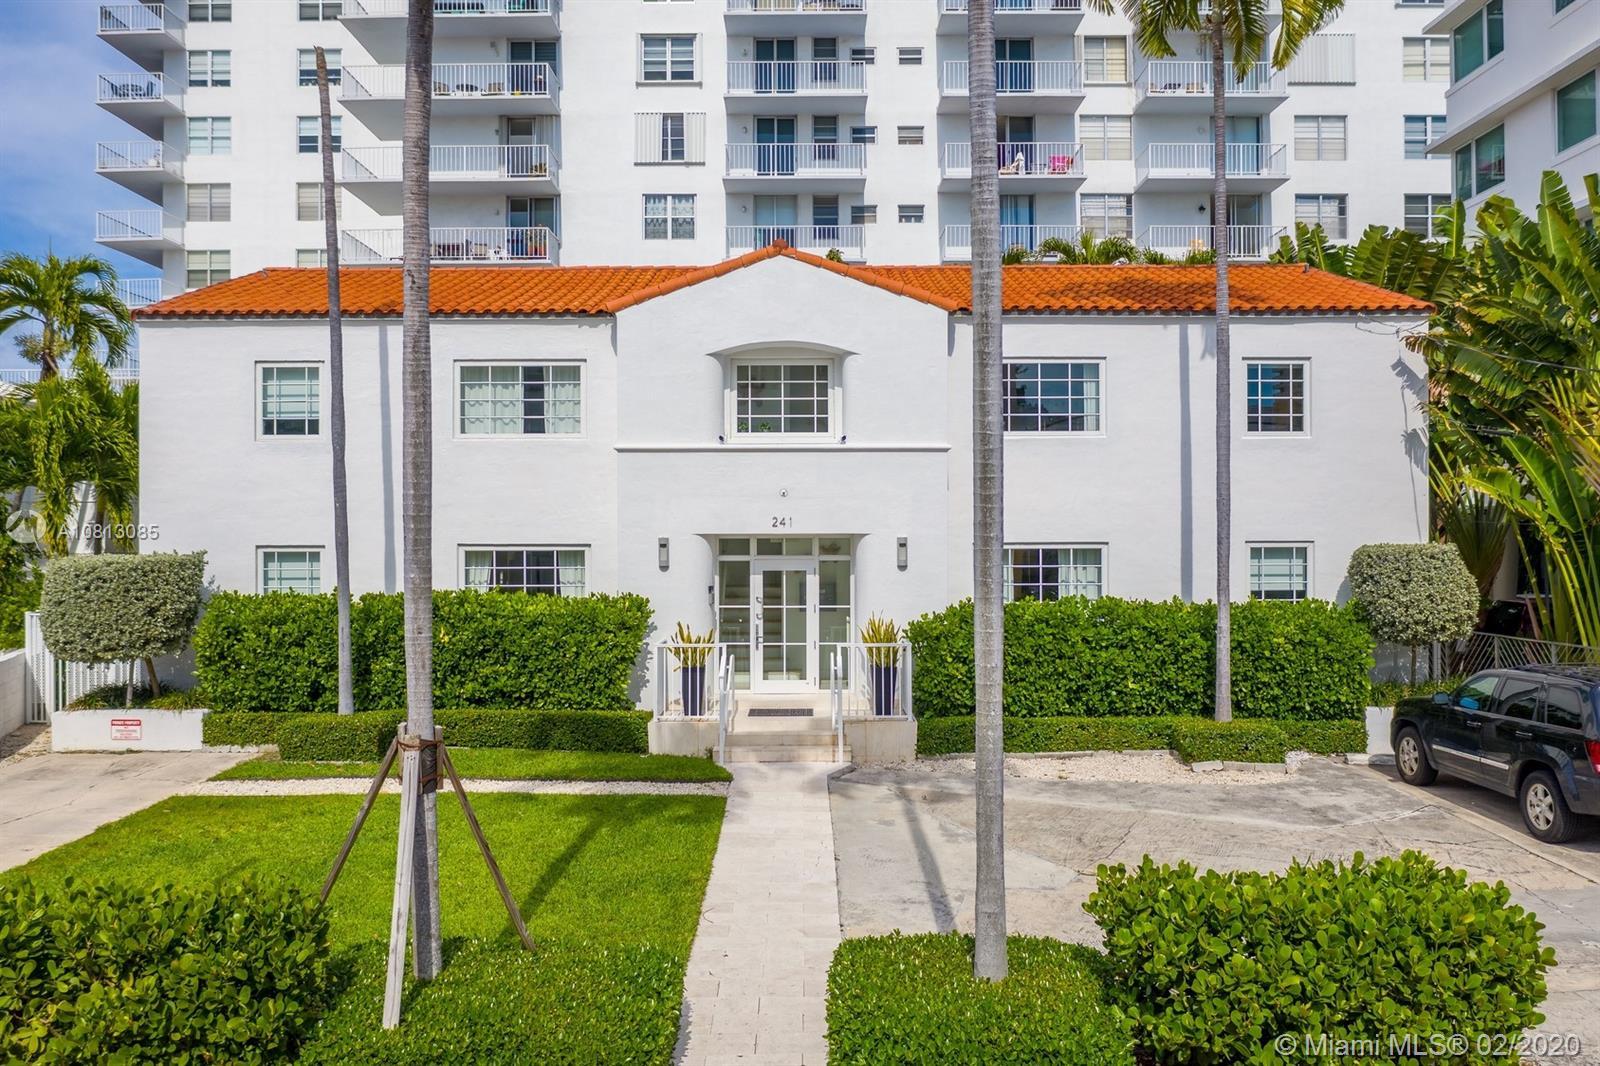 241 28th St - Miami Beach, Florida